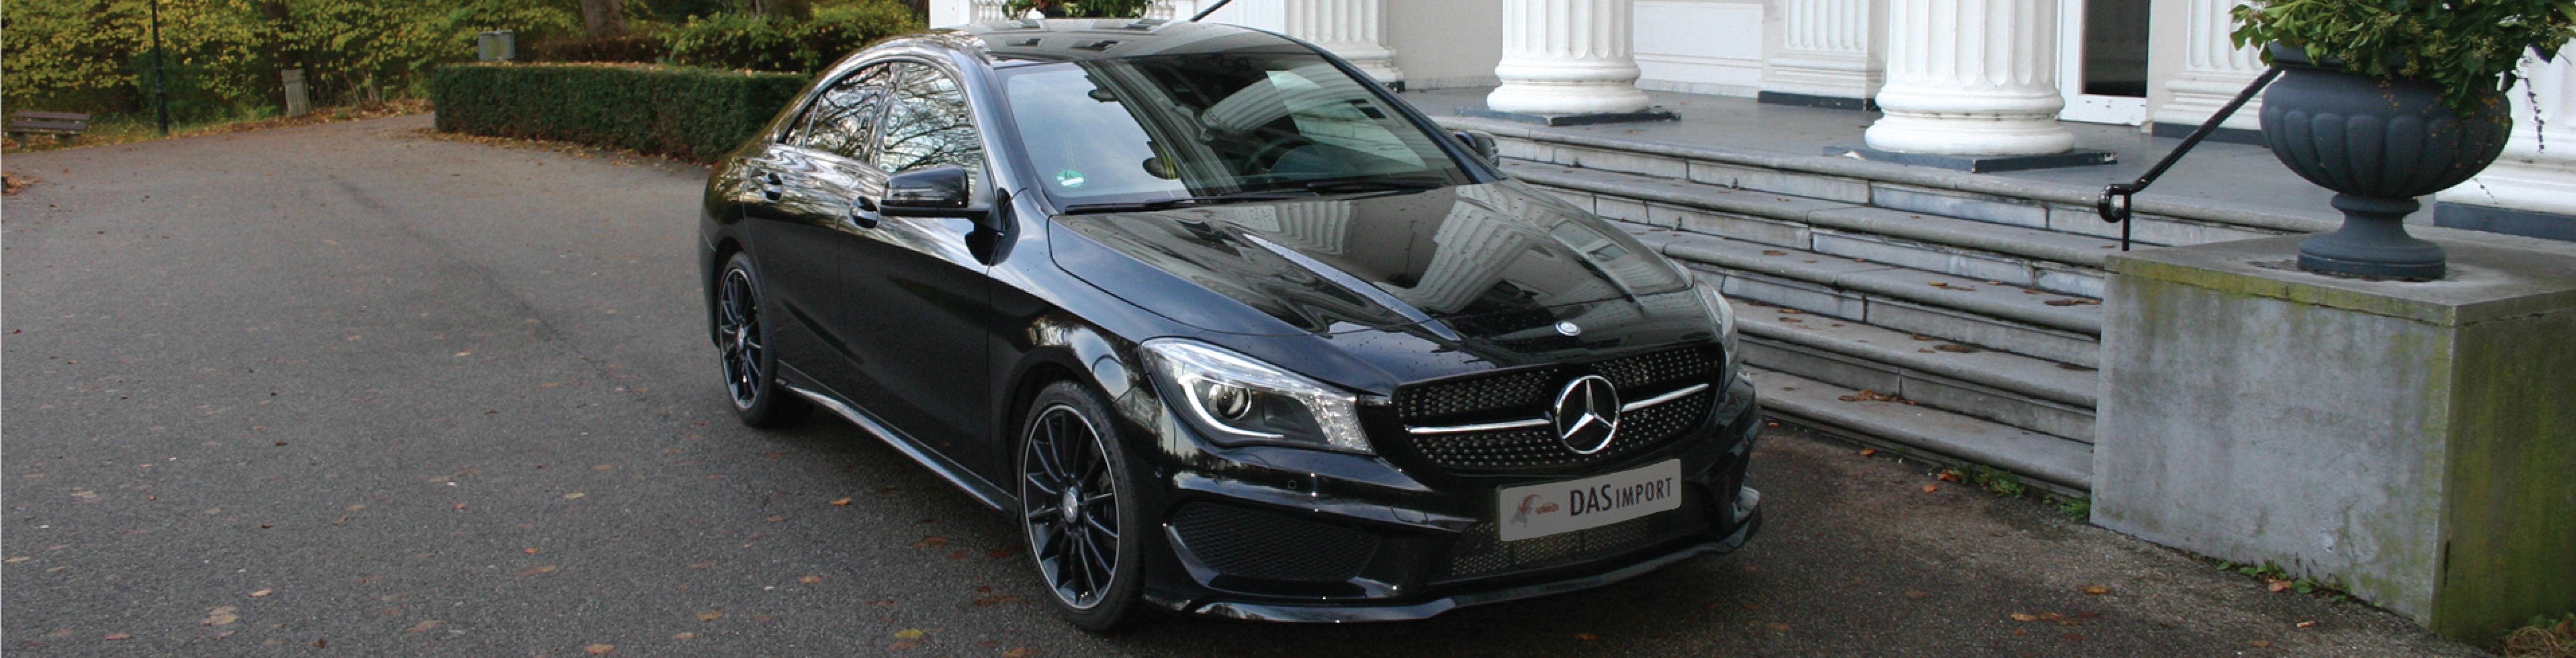 Mercedes-Benz-CLA-uit-Duitsland